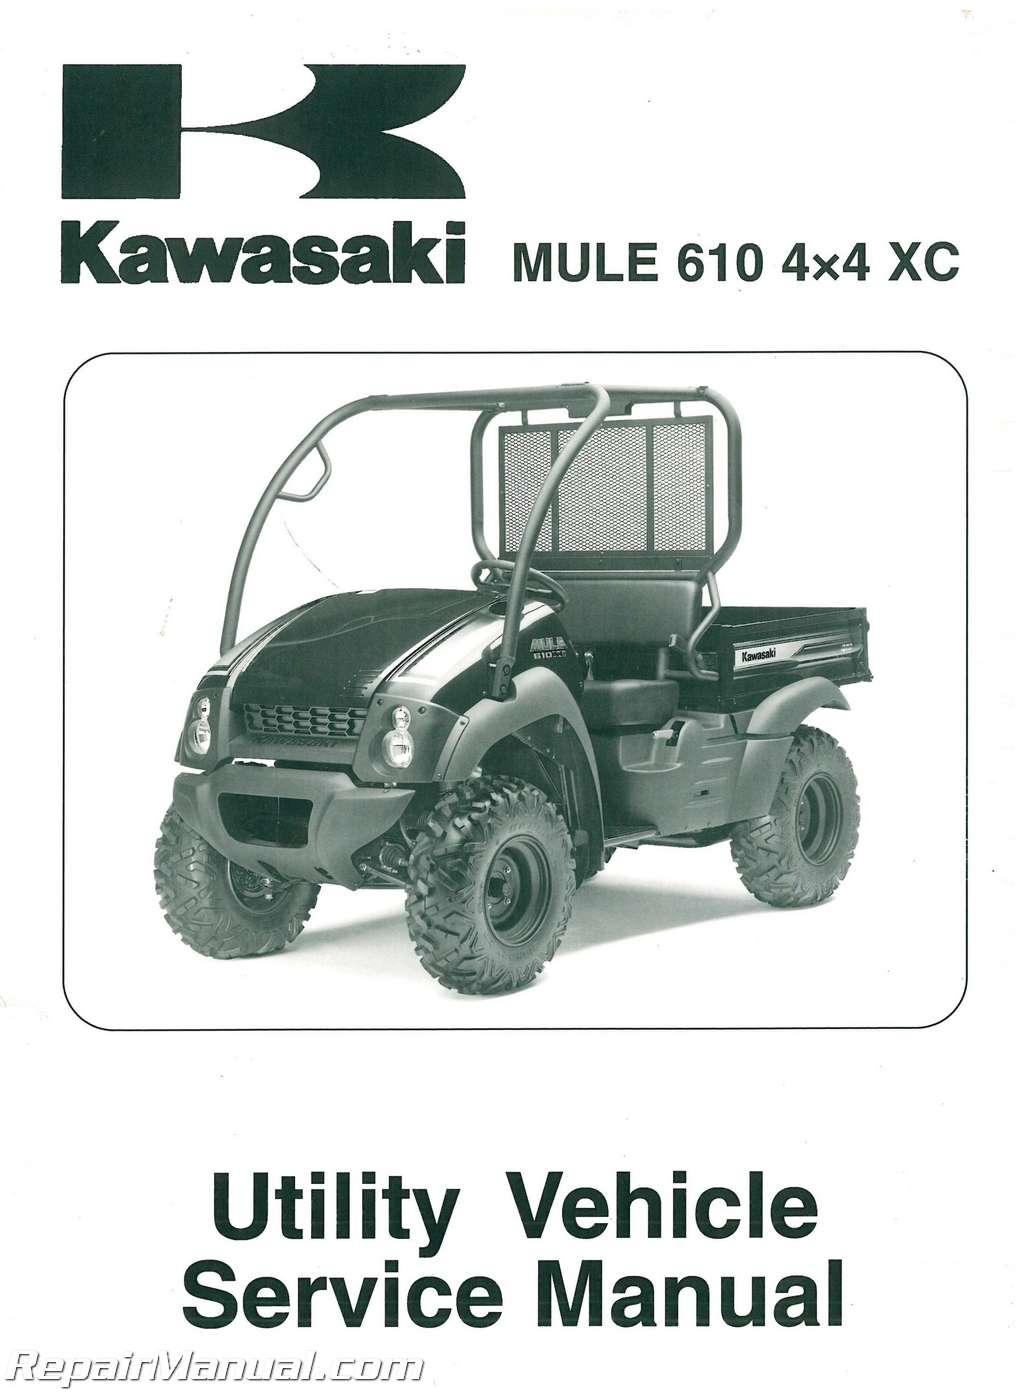 2010 2011 kawasaki kaf400d mule 610 4 4 xc service manual rh repairmanual com 2007 kawasaki mule 610 4x4 owners manual kawasaki mule 610 4x4 service manual download